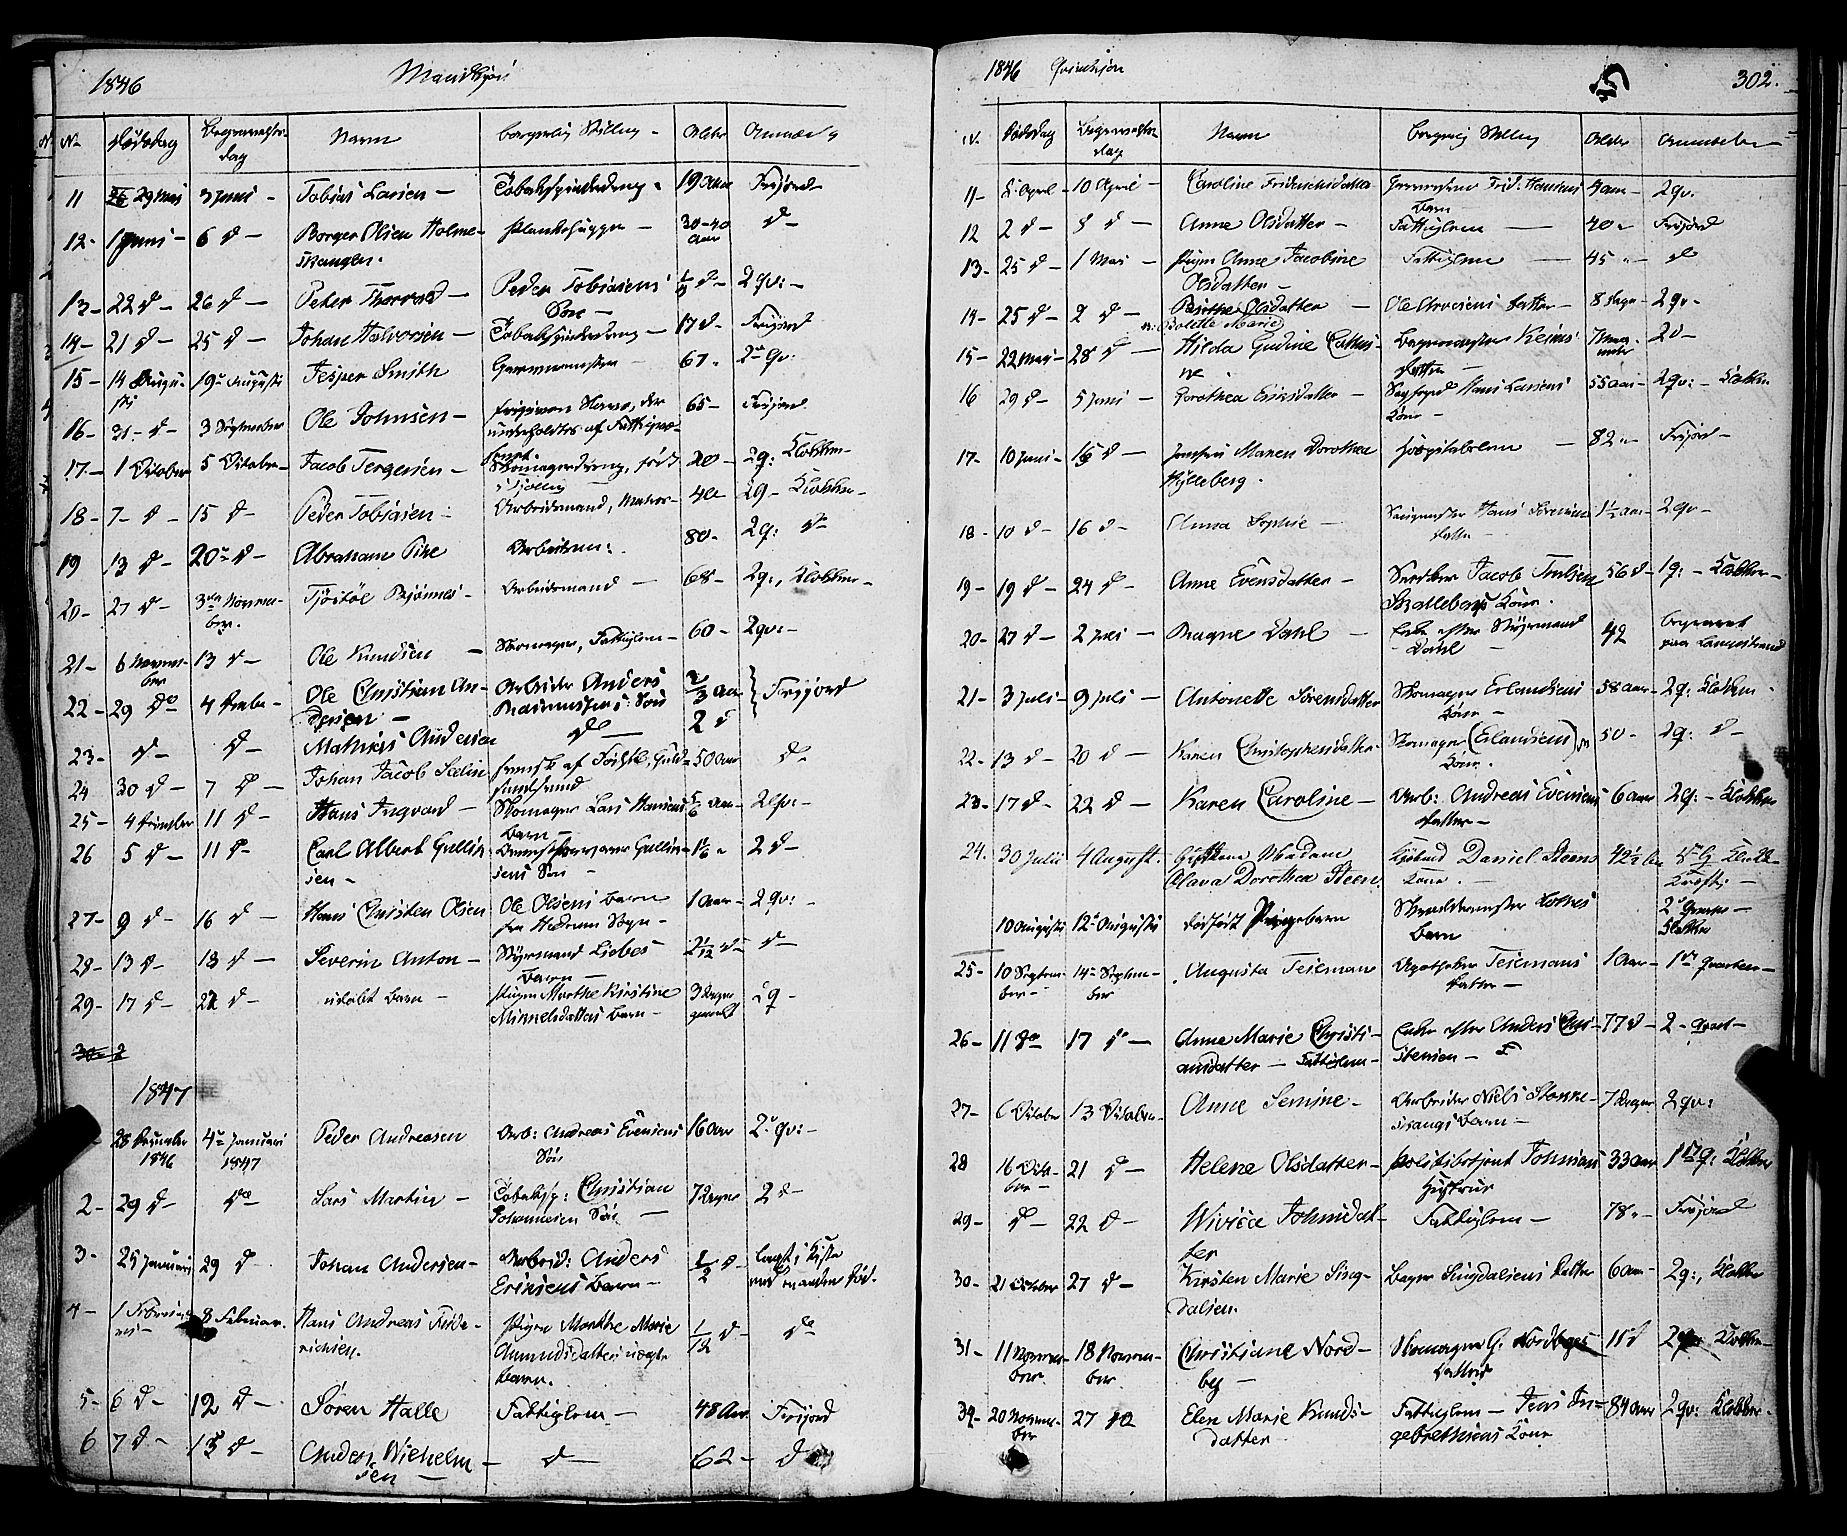 SAKO, Larvik kirkebøker, F/Fa/L0002: Ministerialbok nr. I 2, 1825-1847, s. 302